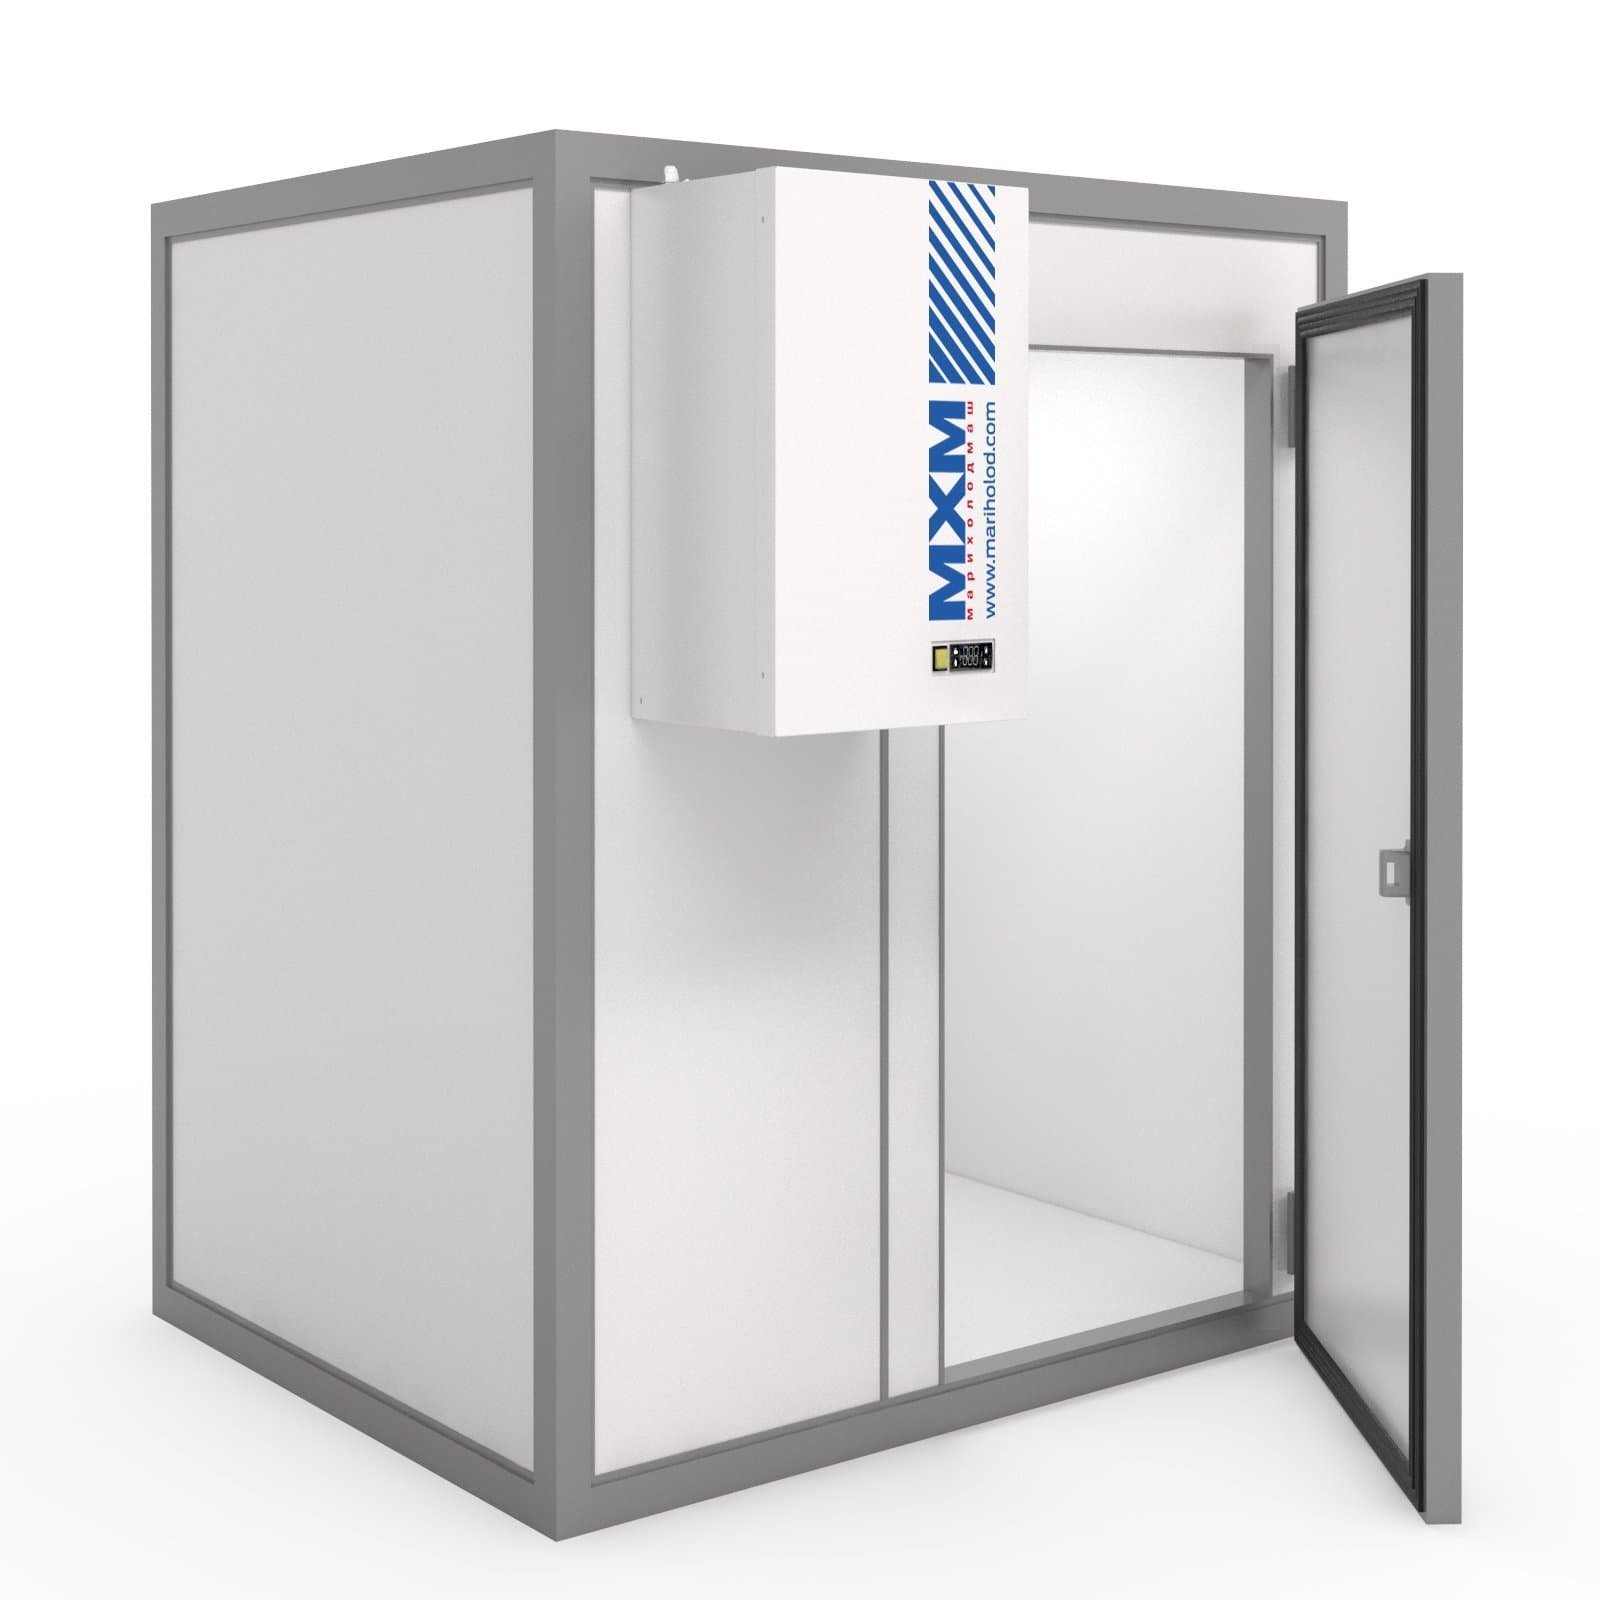 Камера холодильная МХМ КХН-20,29 2260×4360×2460